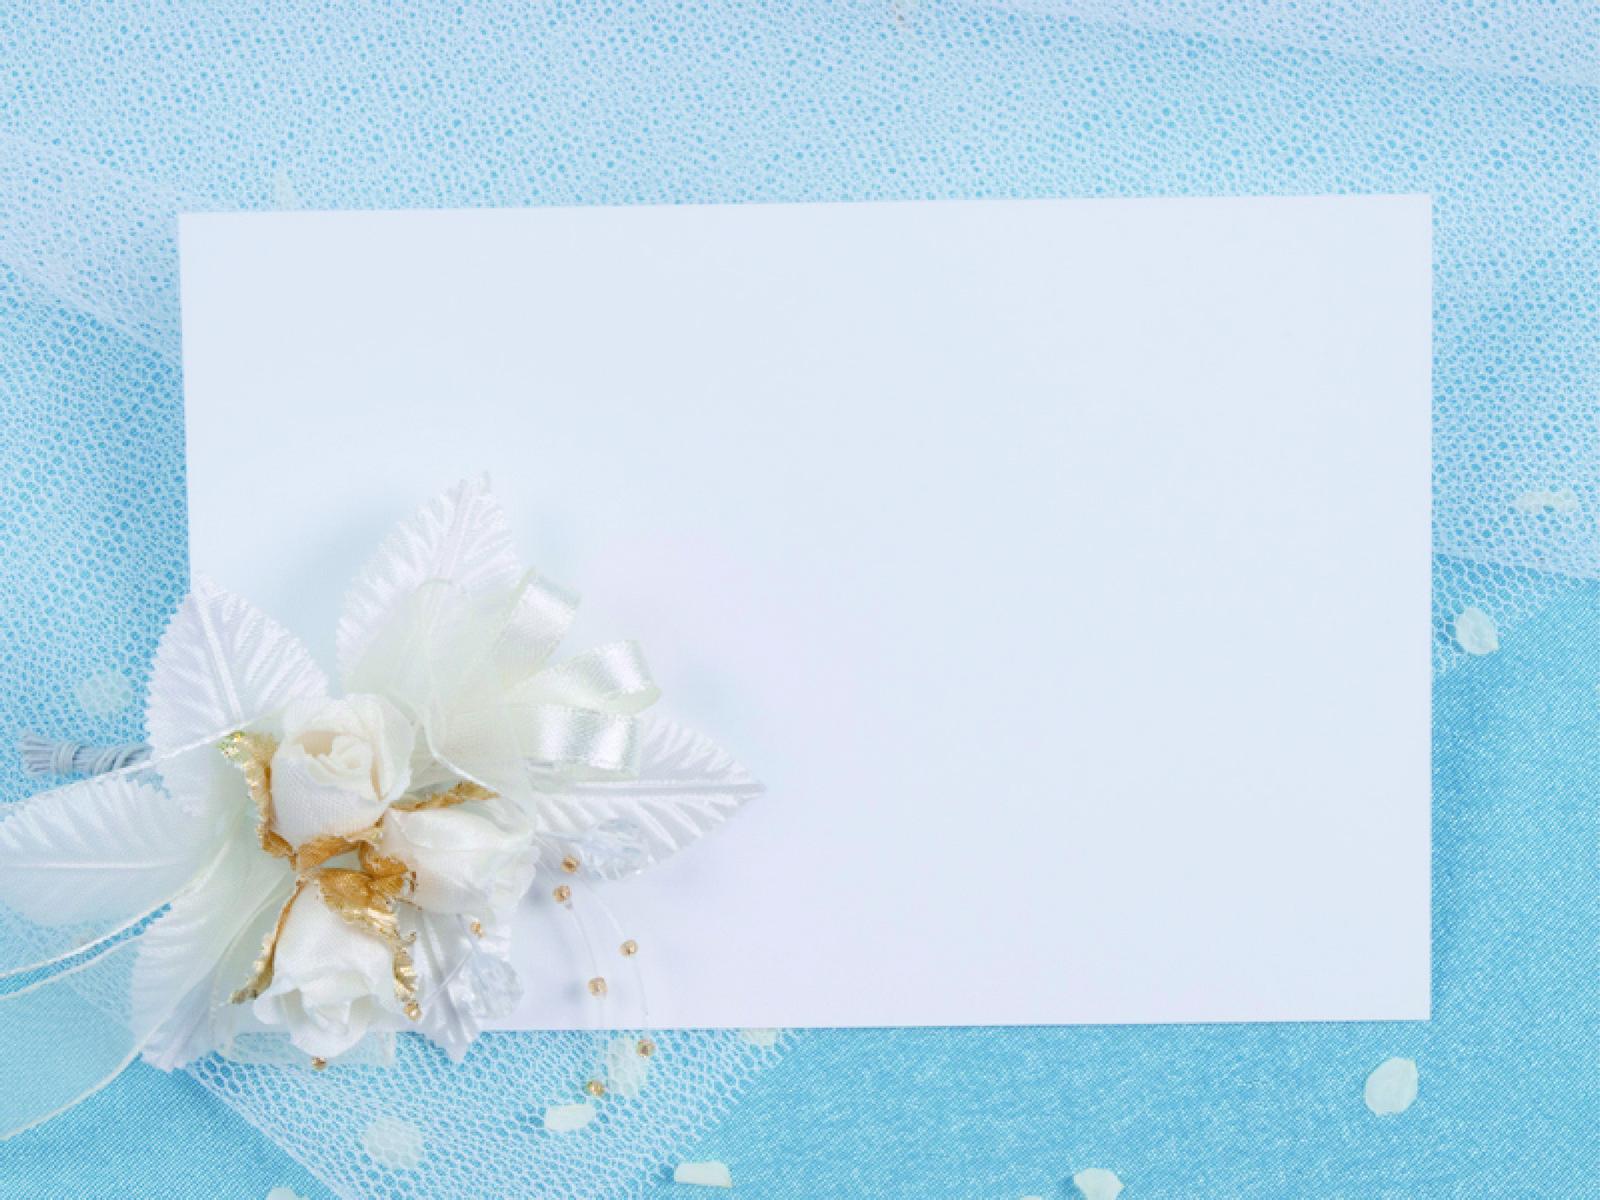 Blue Wedding Celebrate Card PPT Backgrounds